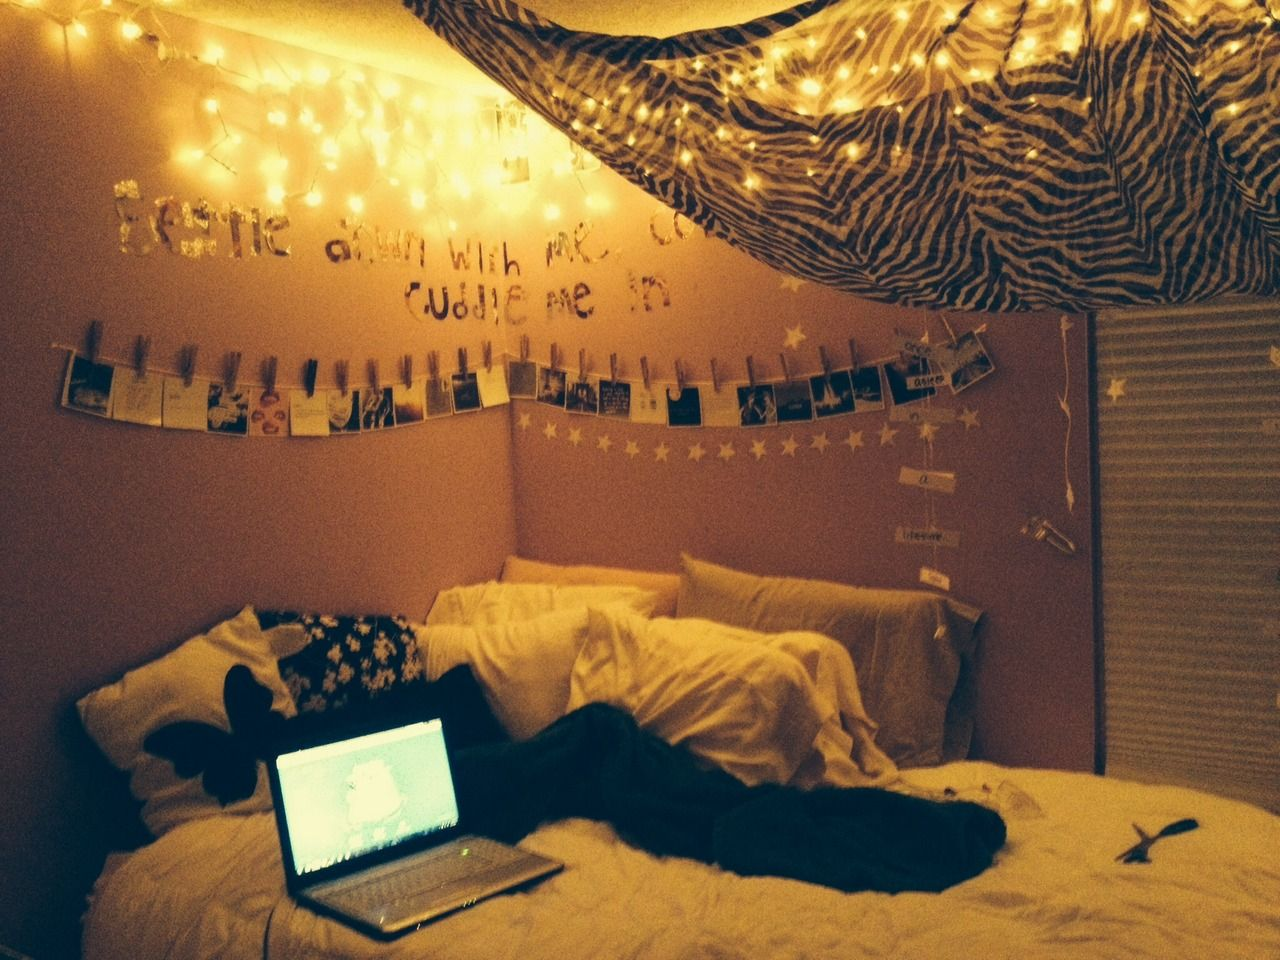 Tumblr Bedrooms Hipster Bedroom Hipster Room Cute Bedroom Ideas